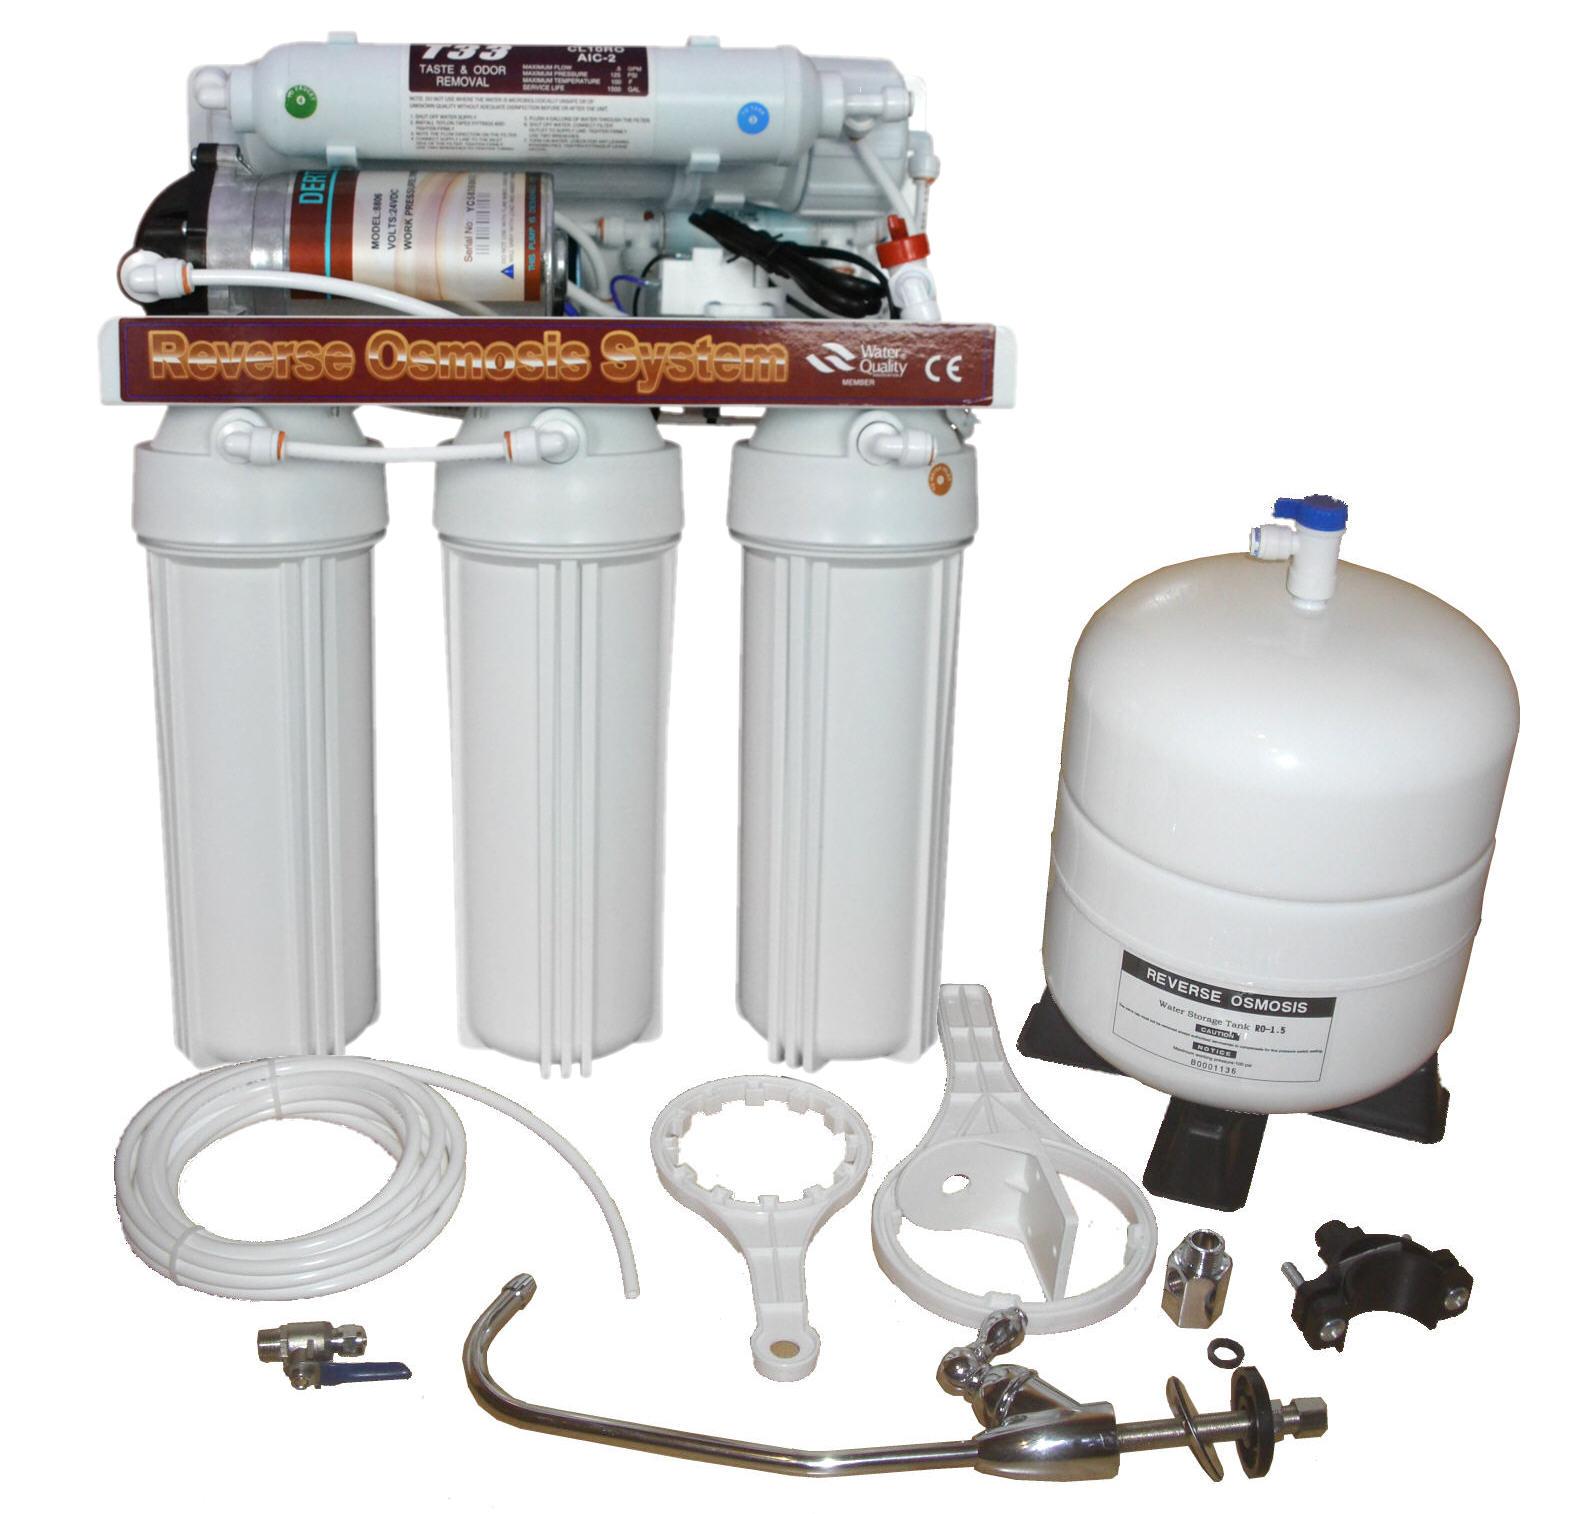 Standard Umkehrosmose Filteranlage mit Pumpe und Tank 190 Liter/Tag Killus-Technik.de